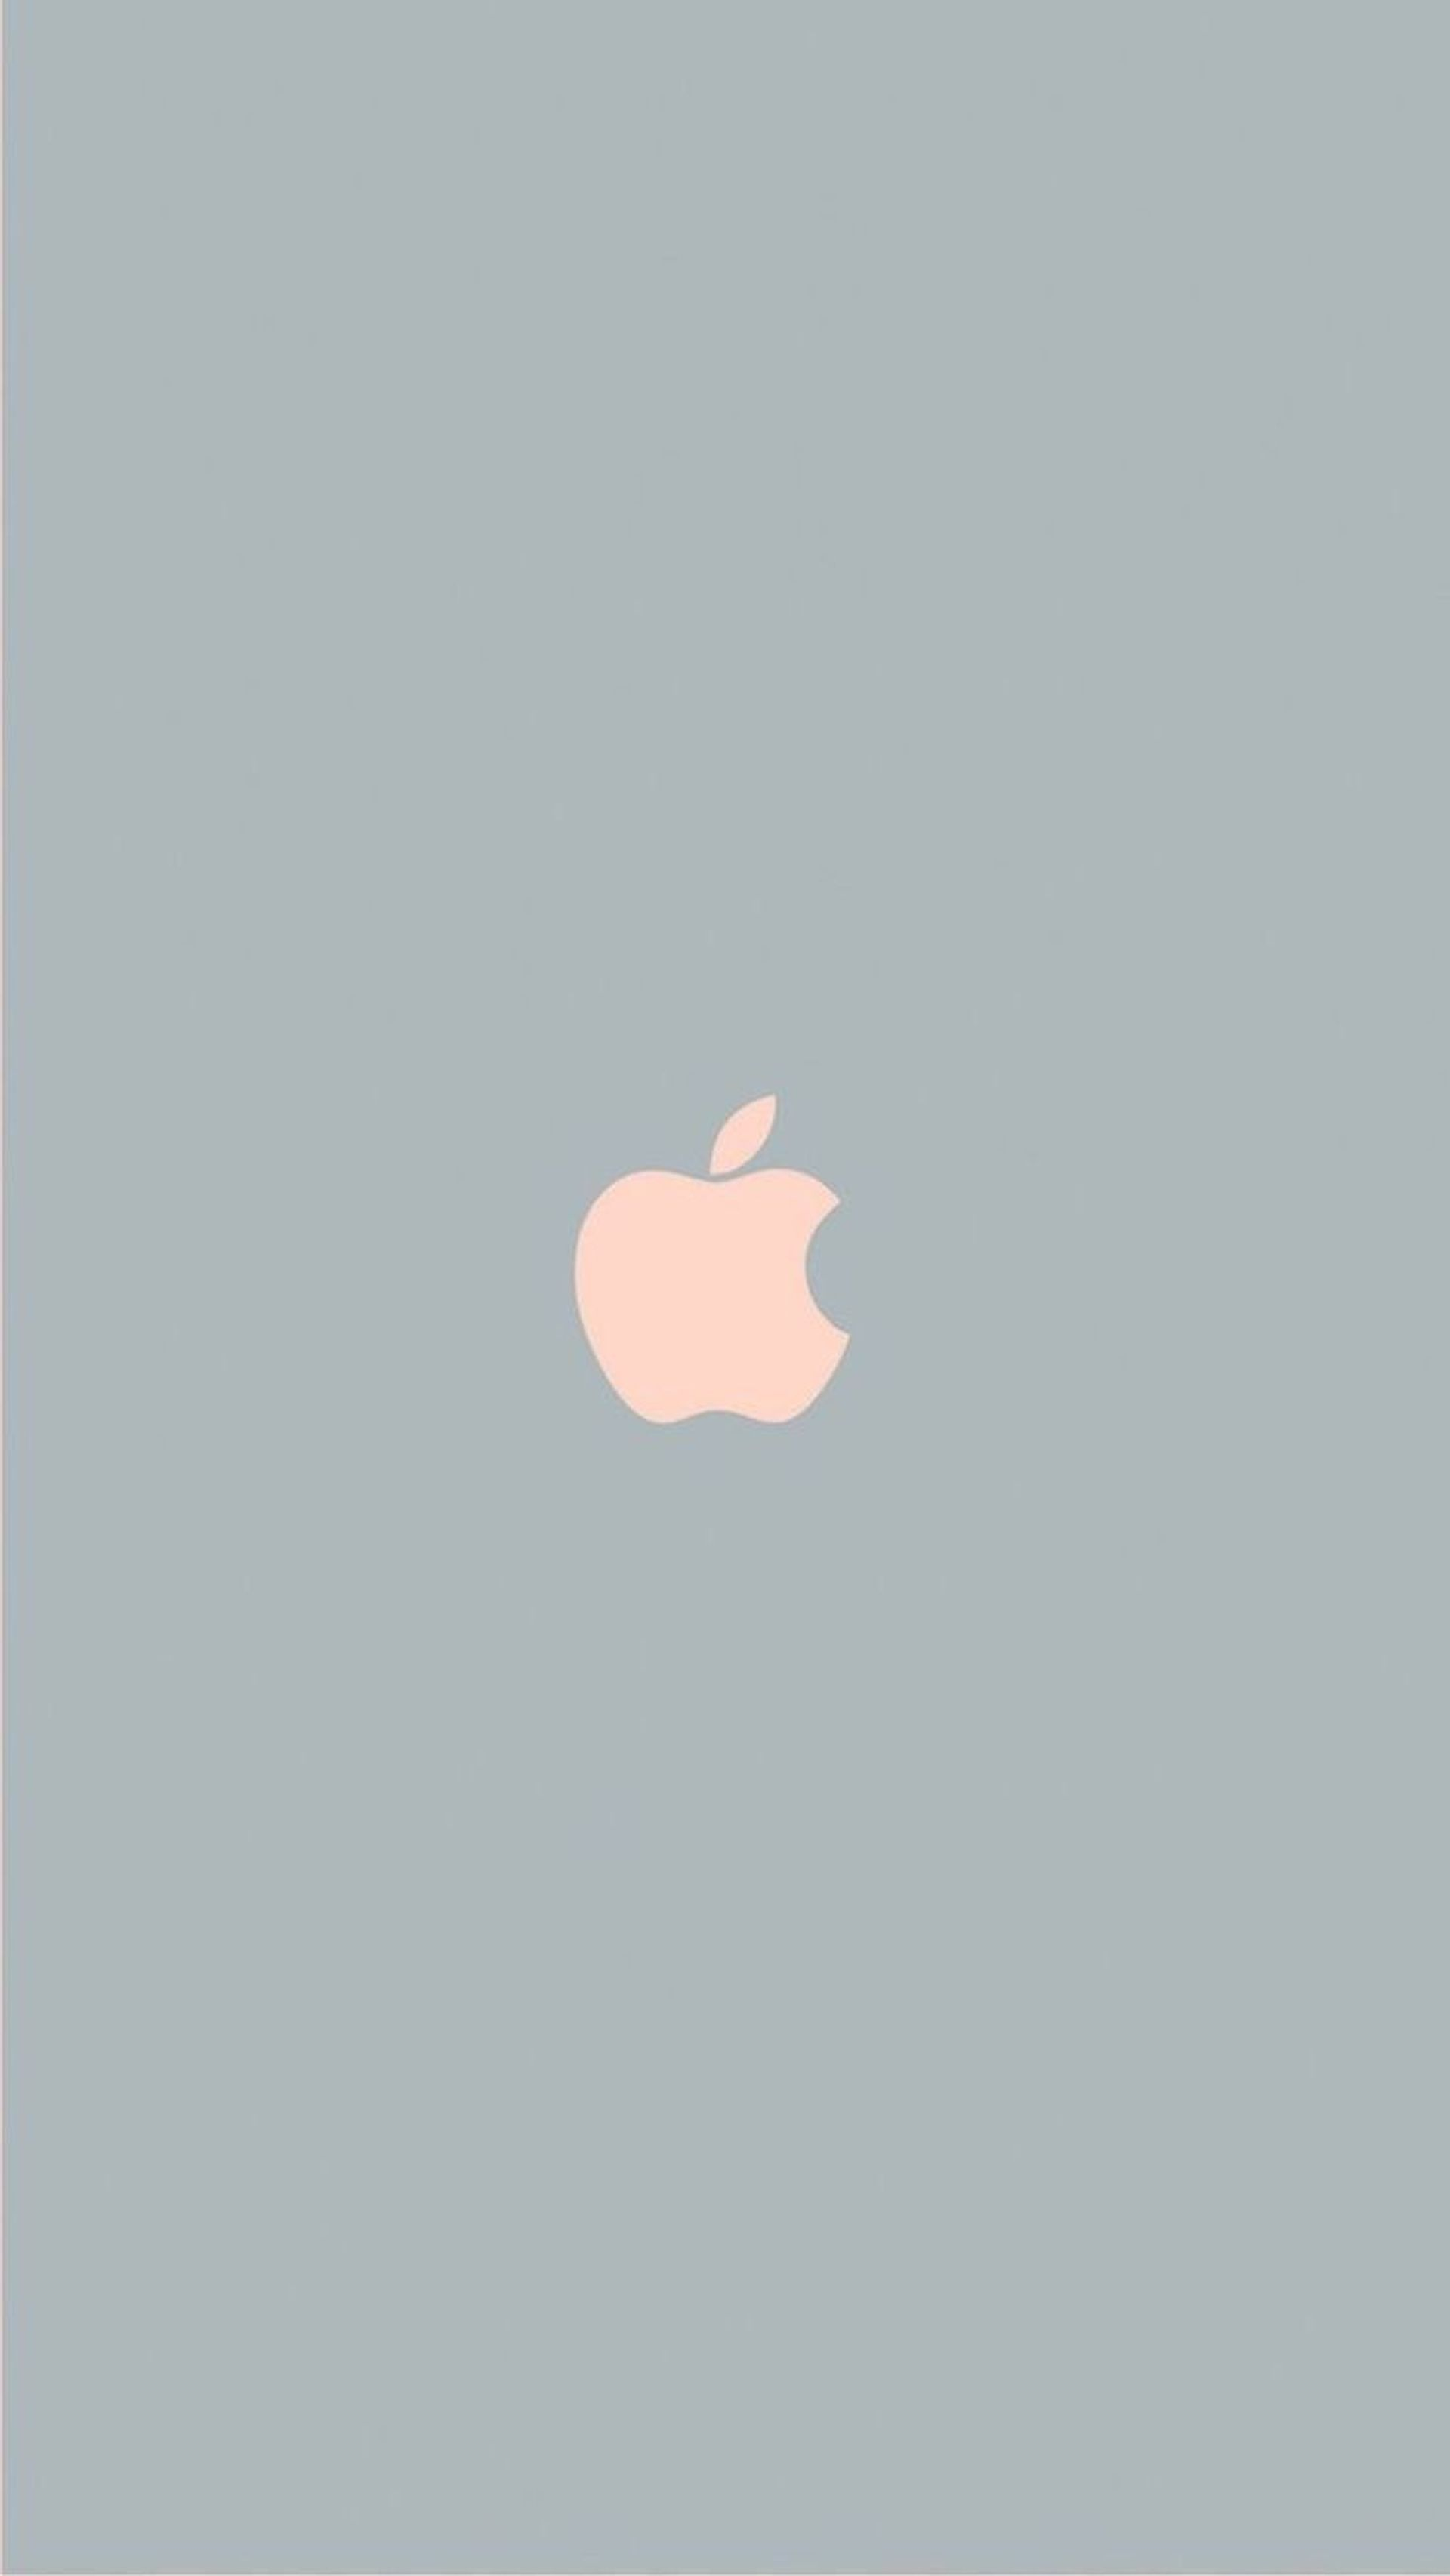 Log In Apple Logo Wallpaper Iphone Apple Wallpaper Iphone